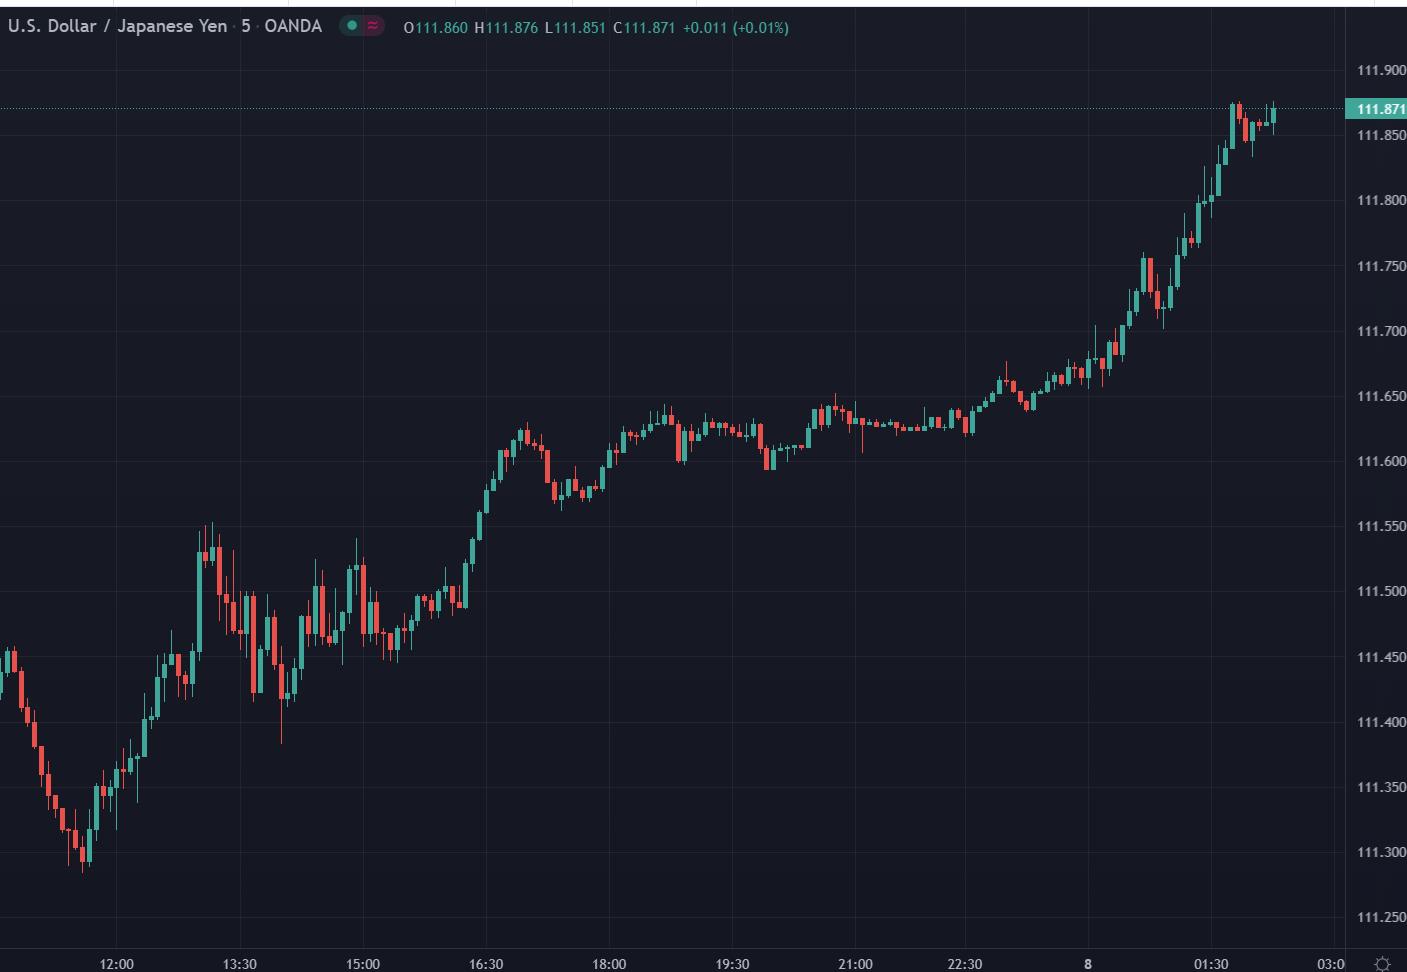 Yen continues its slide